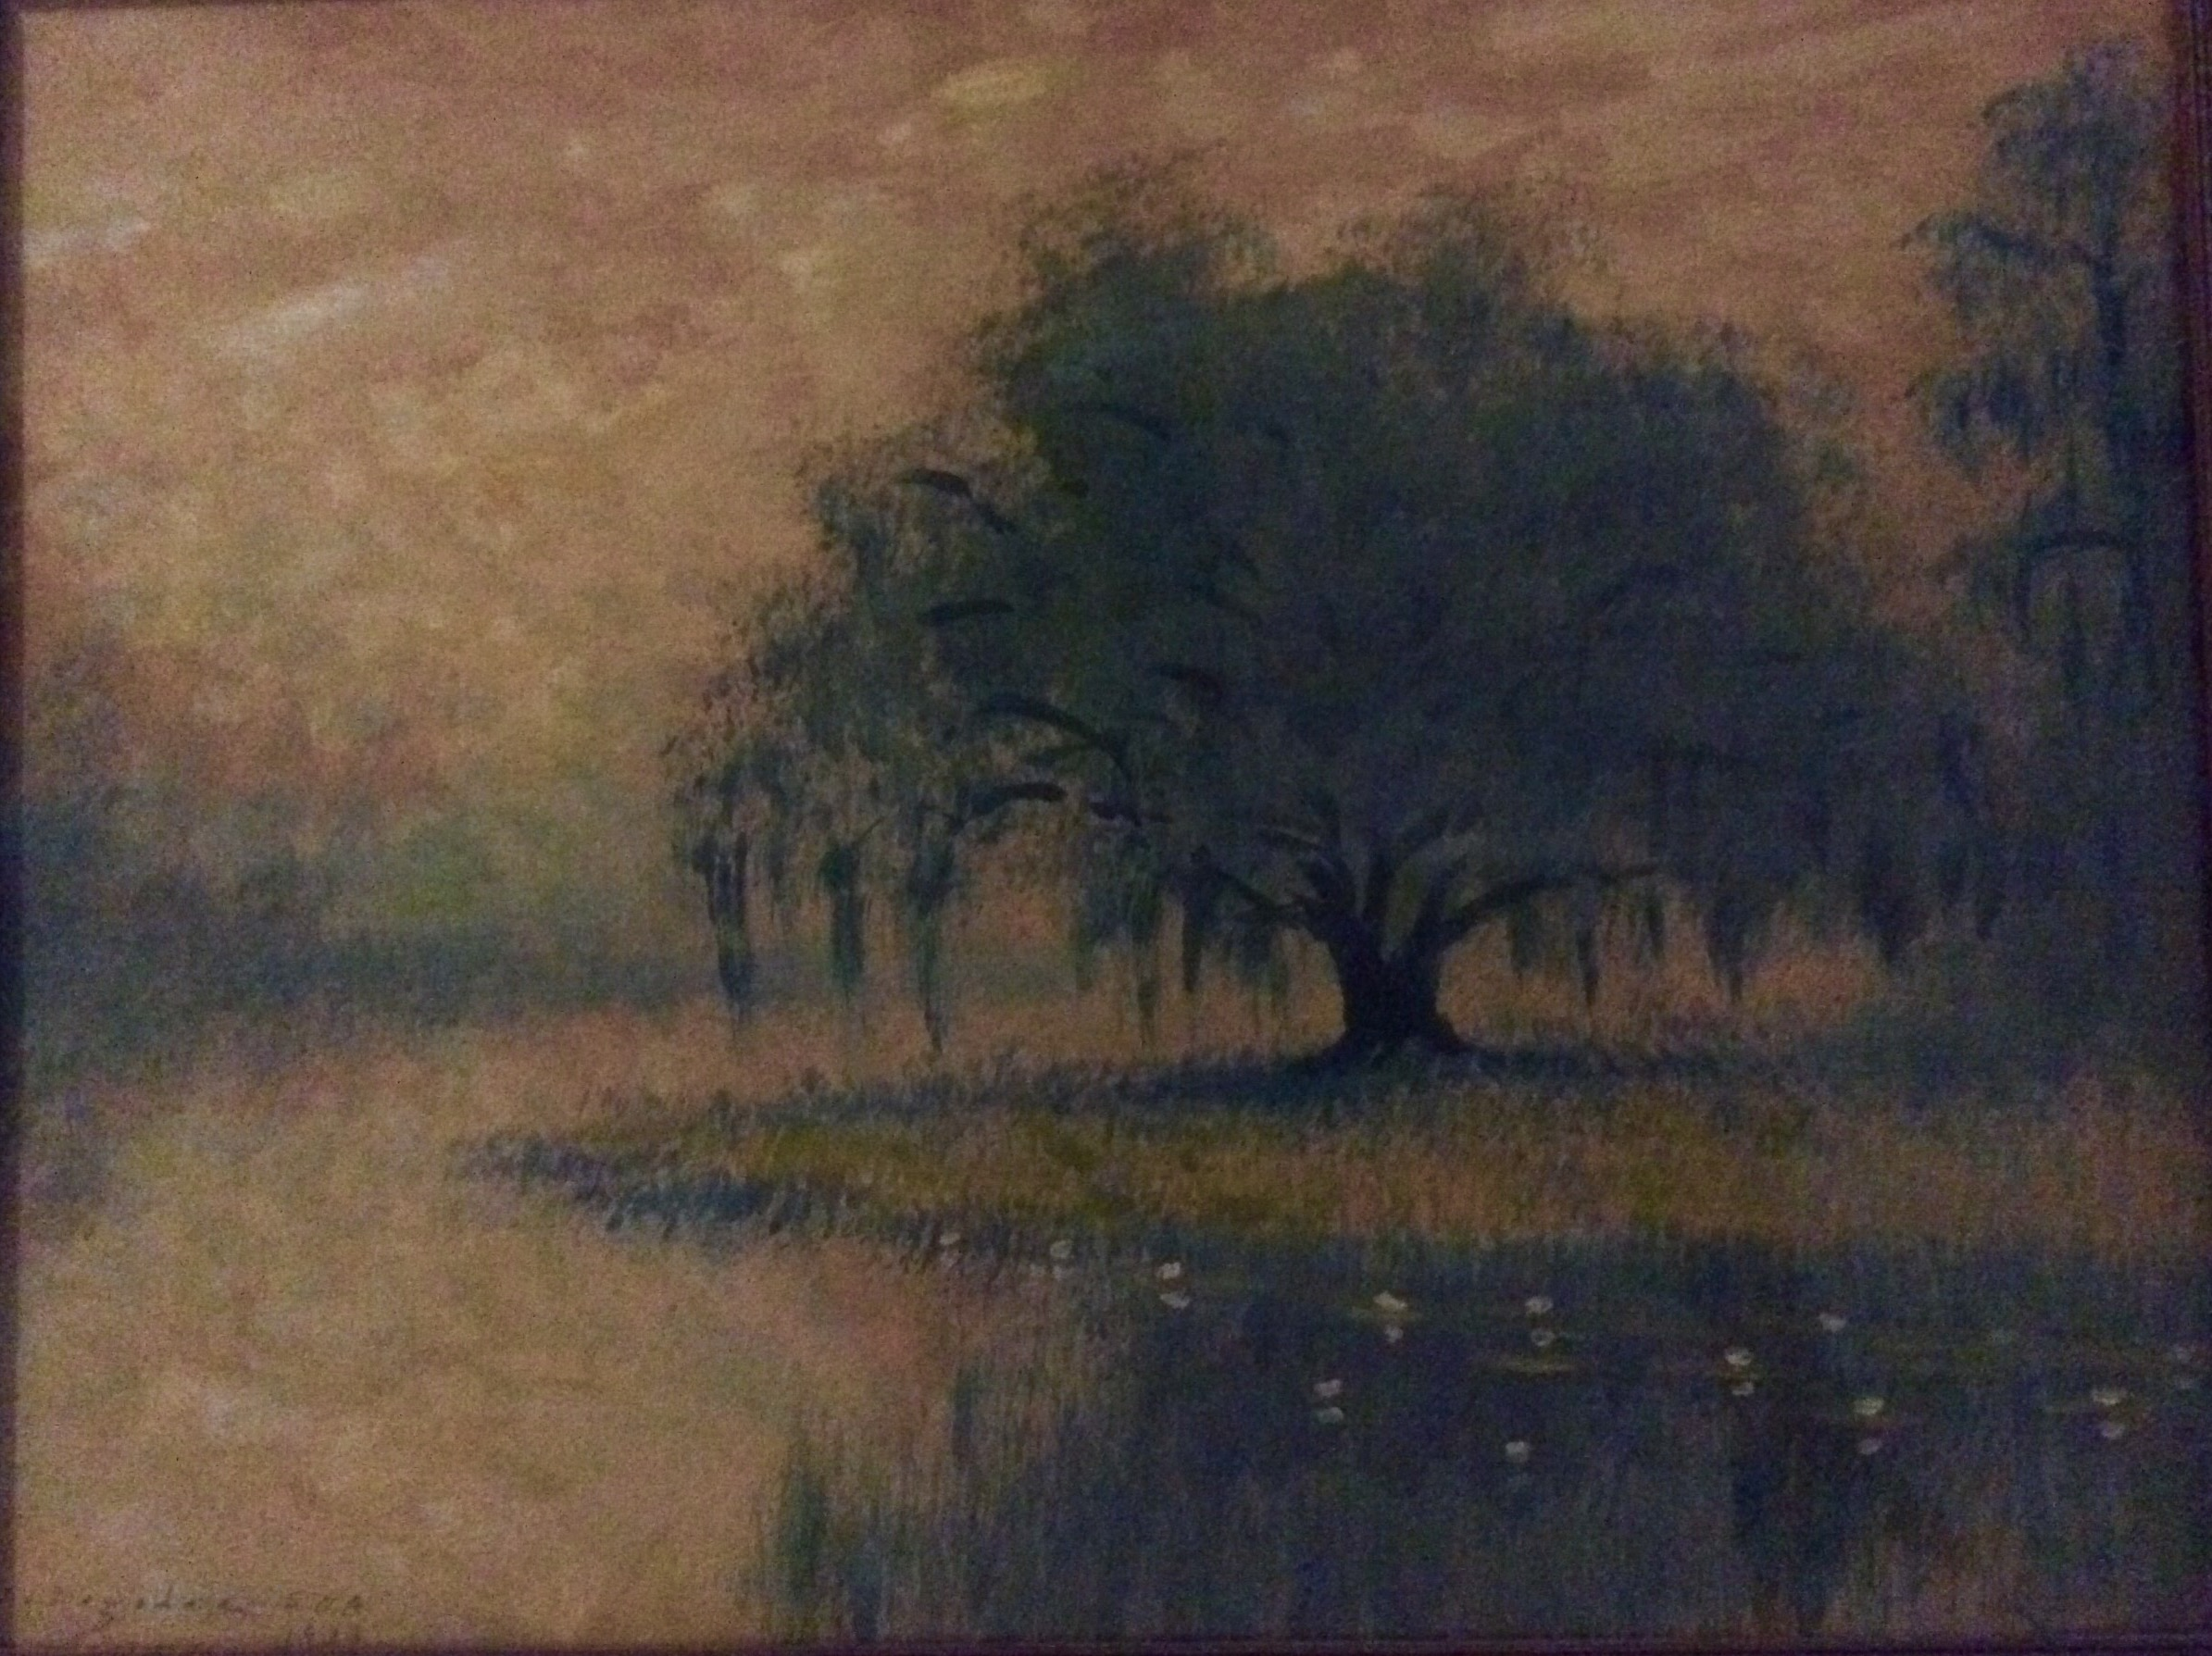 Louisiana Landscape artwork by Alexander Drysdale - art listed for sale on Artplode